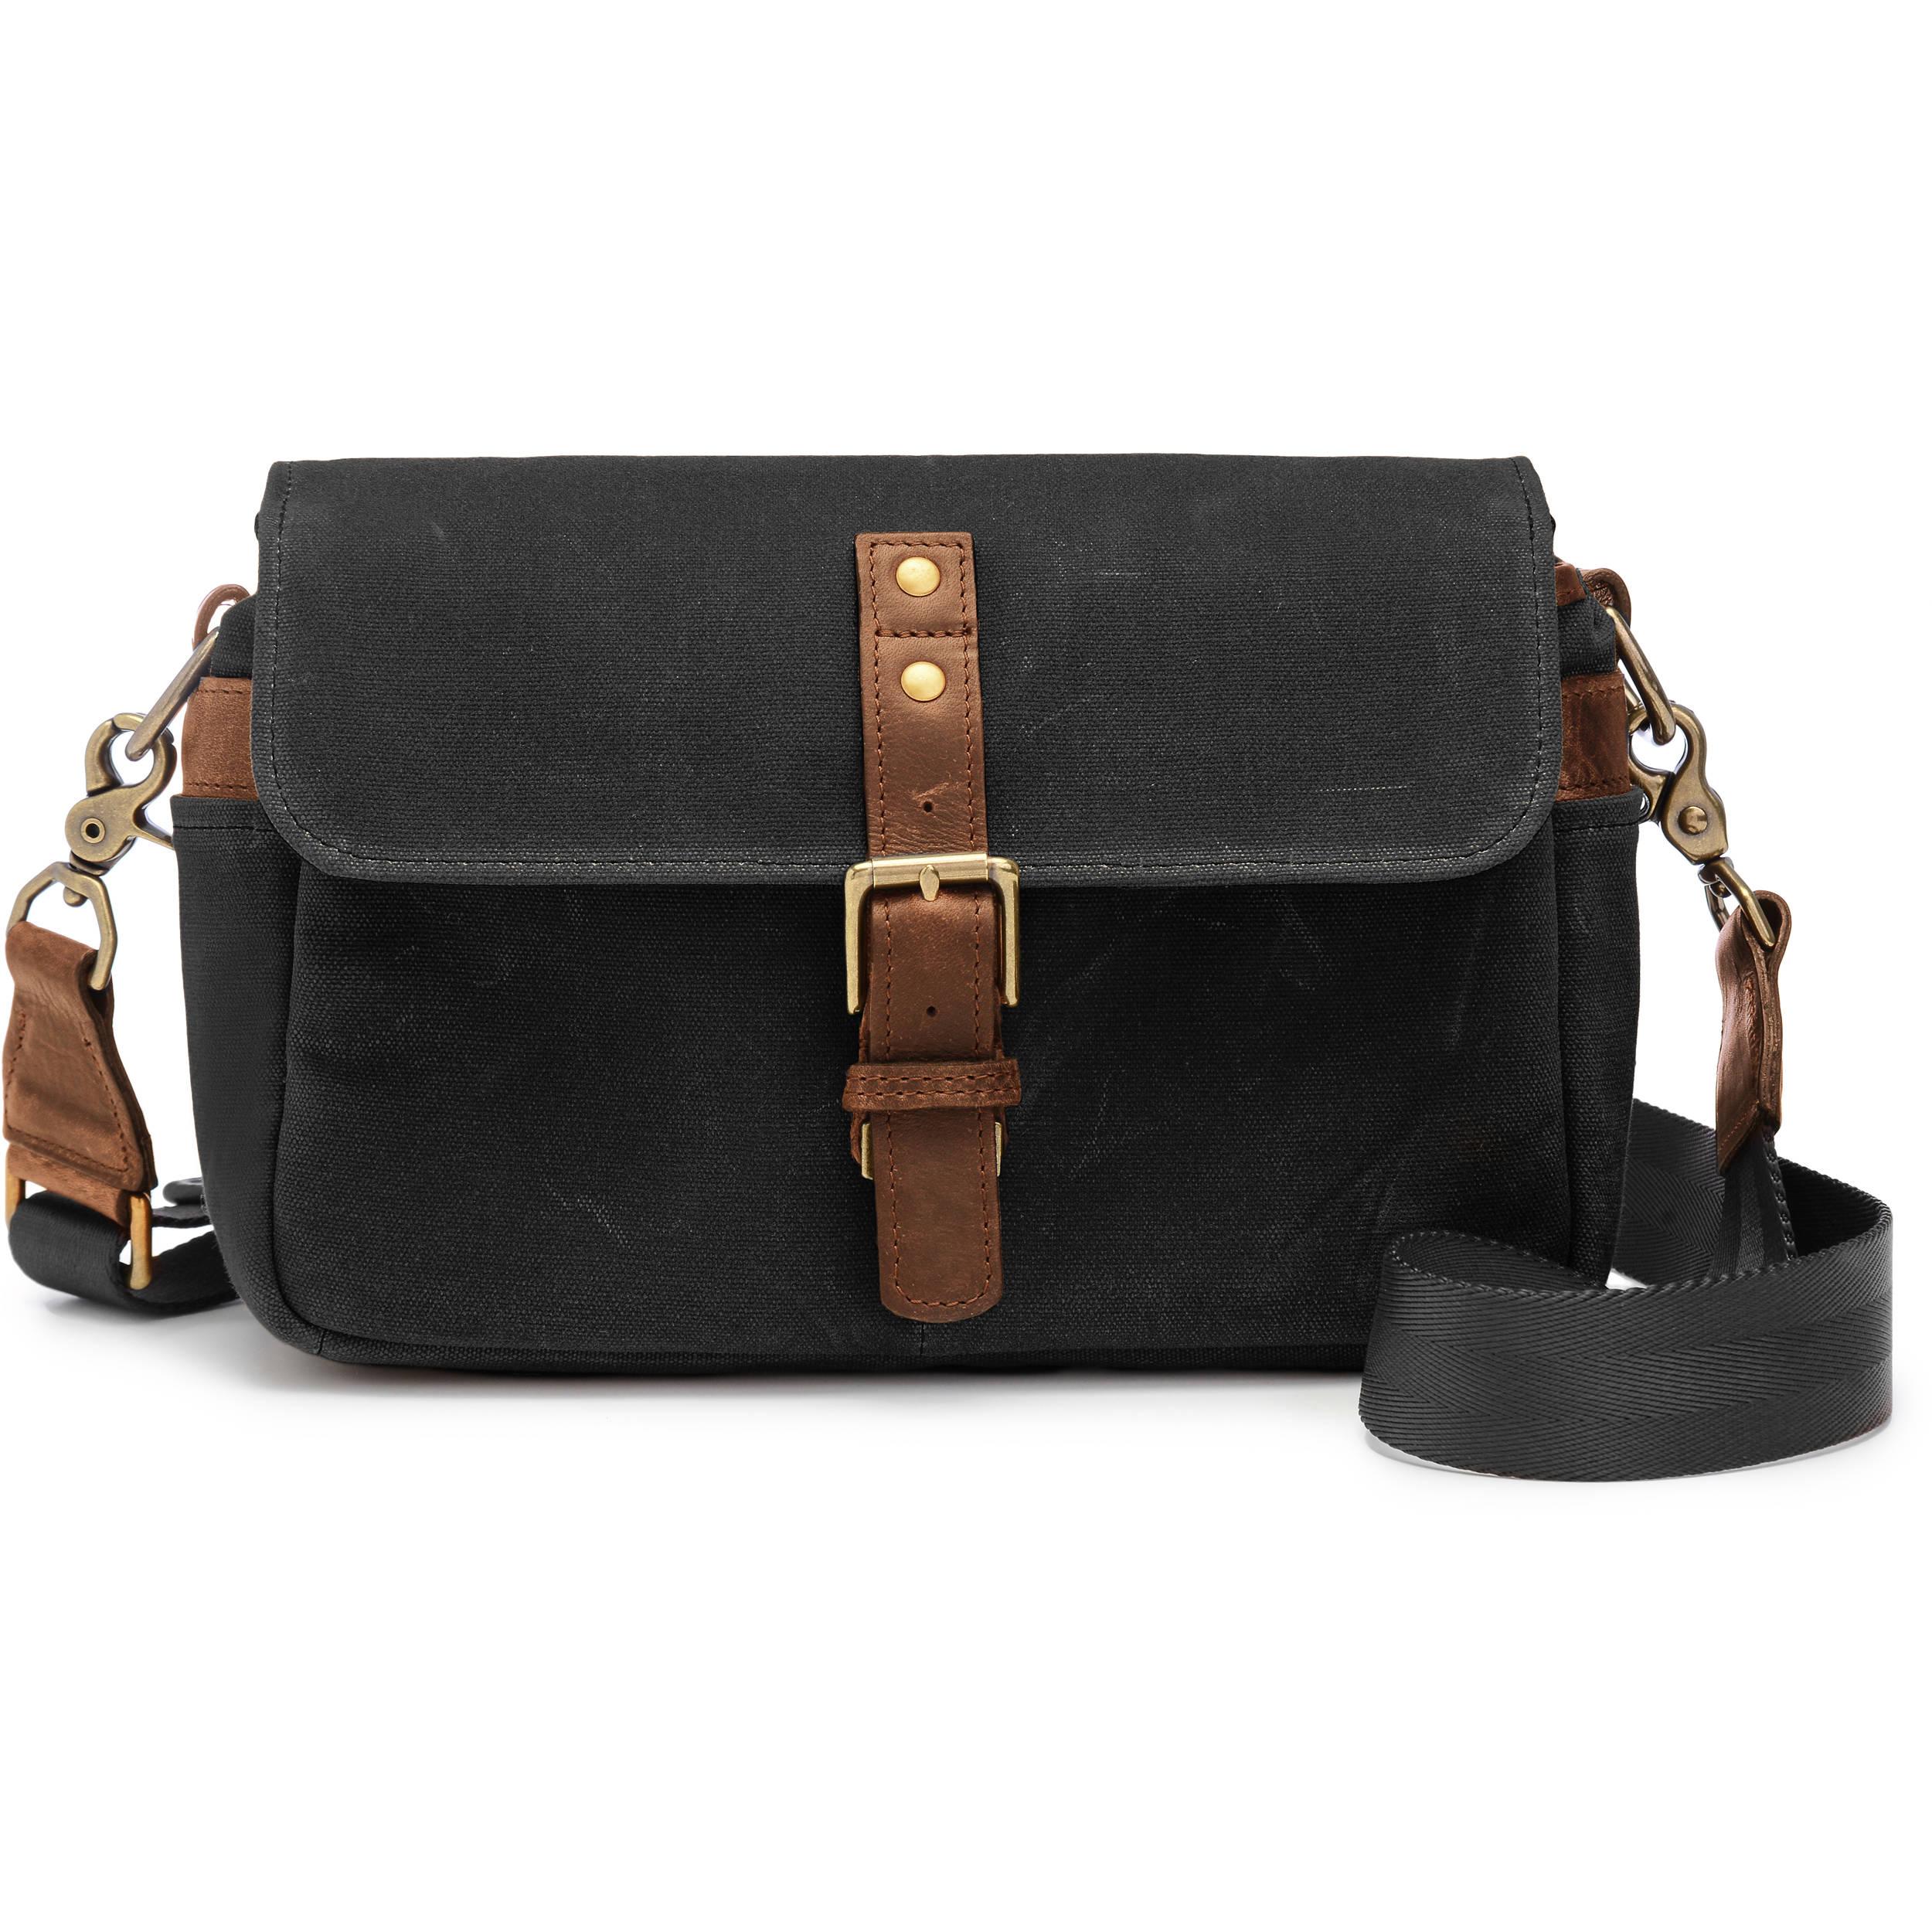 Ona Bowery Camera Bag Canvas Black